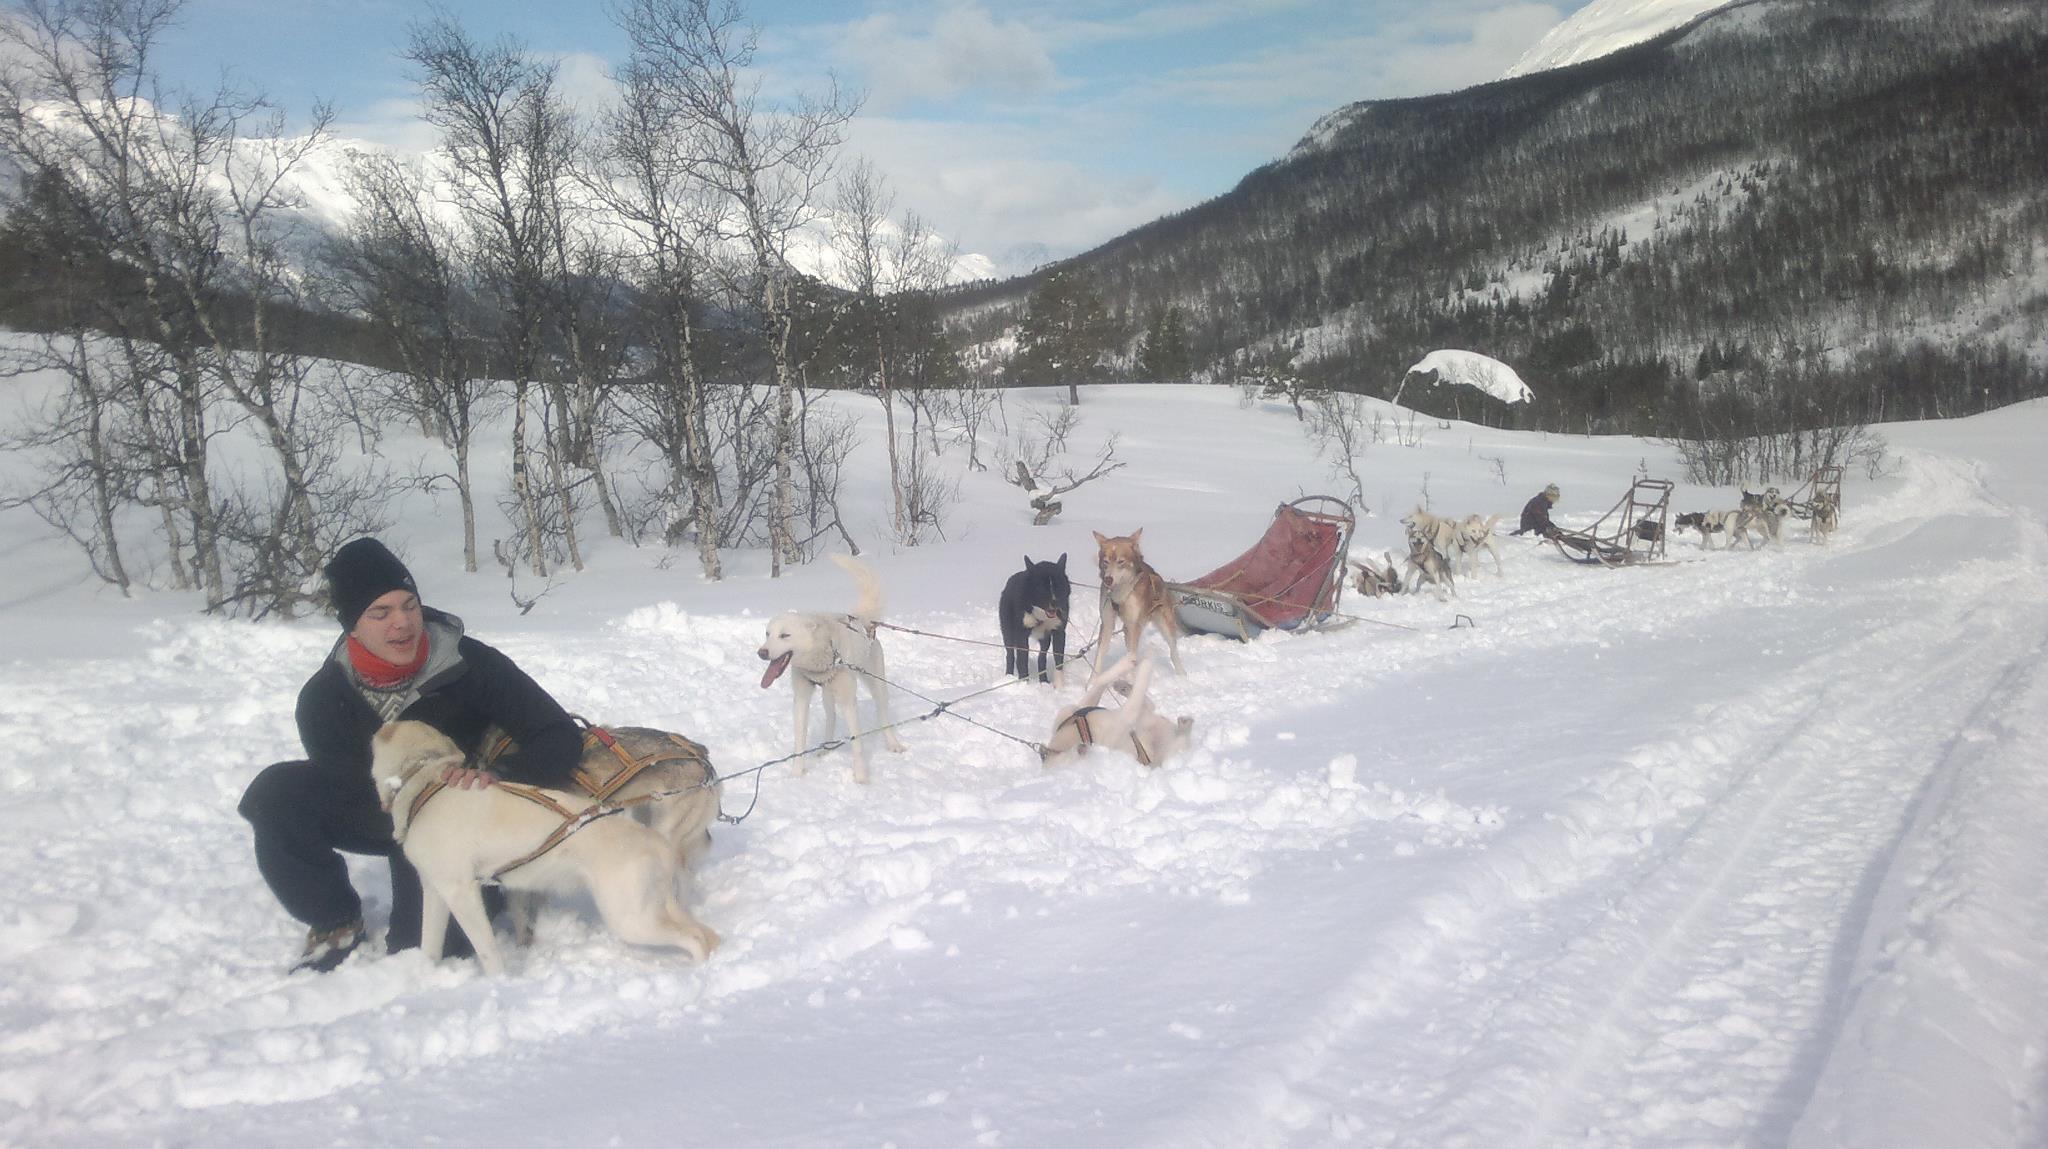 Dog sledding Arctic Cruie In Norway 3.jpg